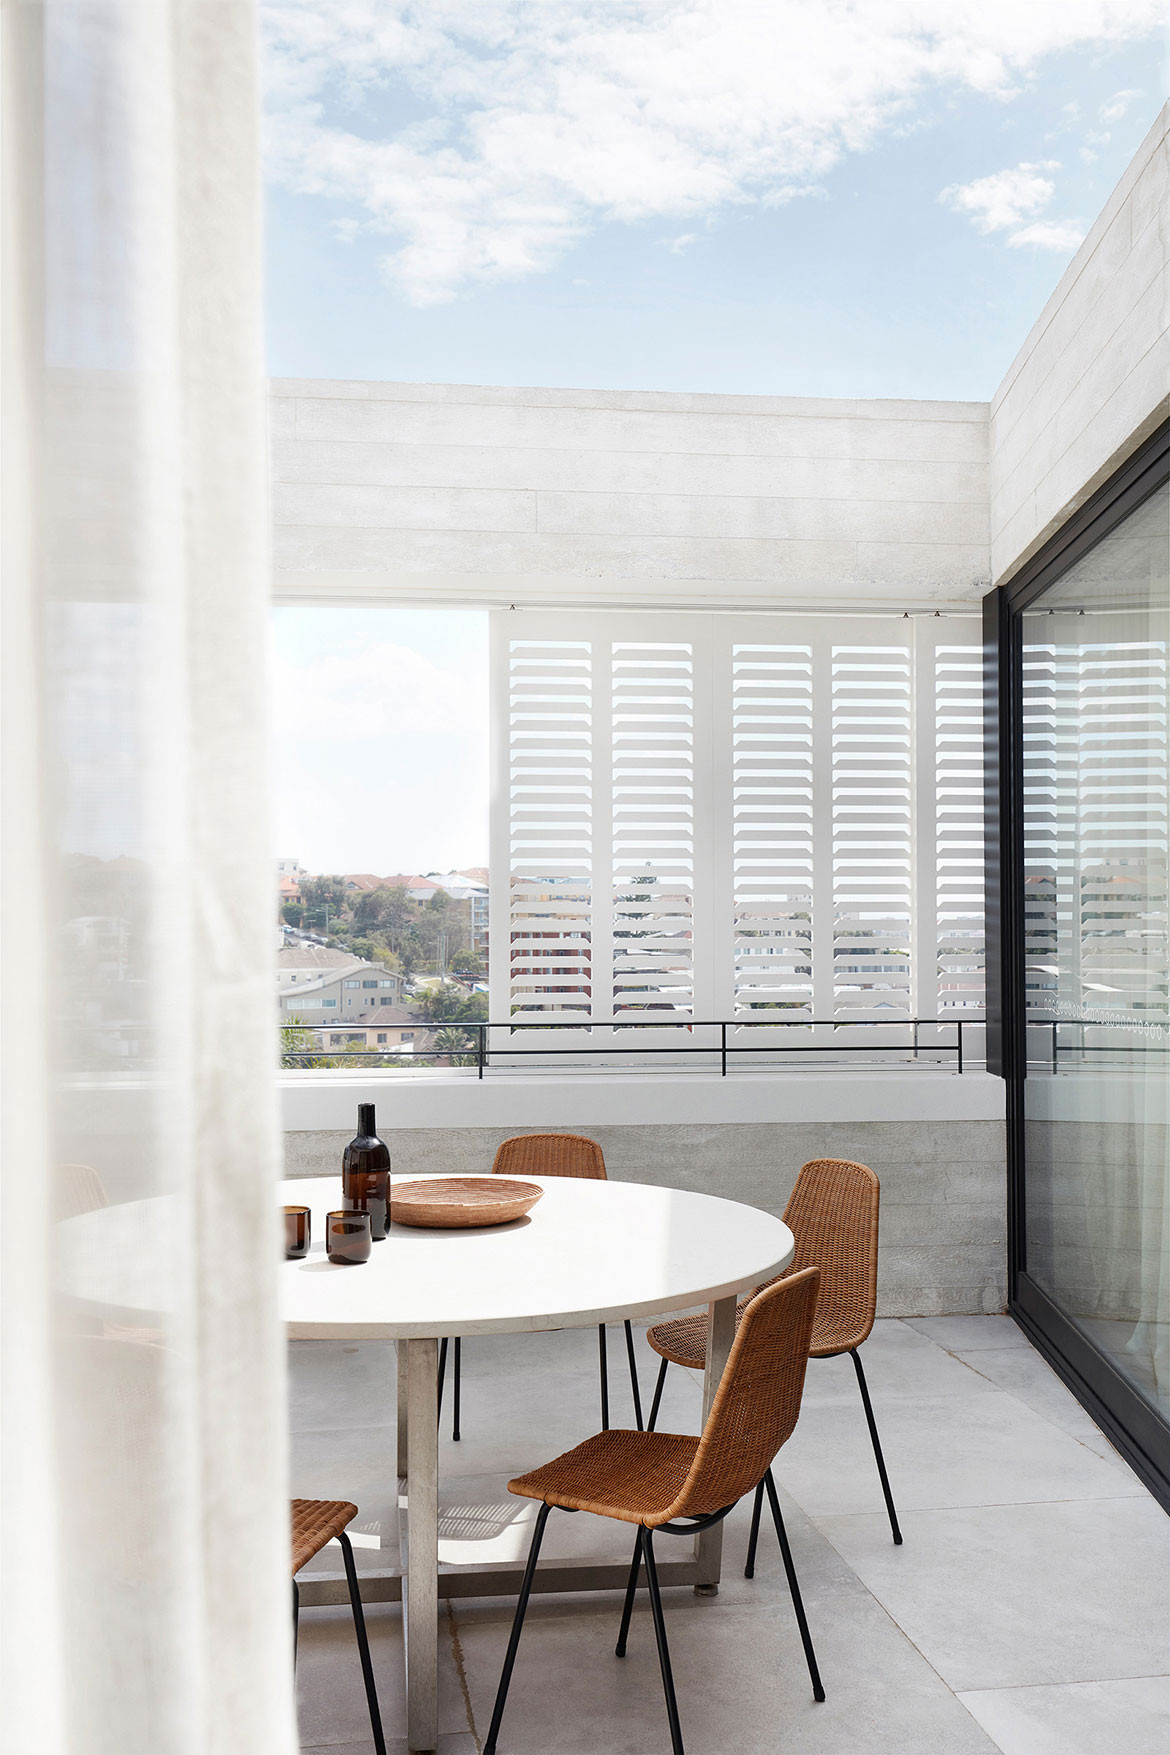 Tamas Tee House Luigi Rosselli Architects balcony